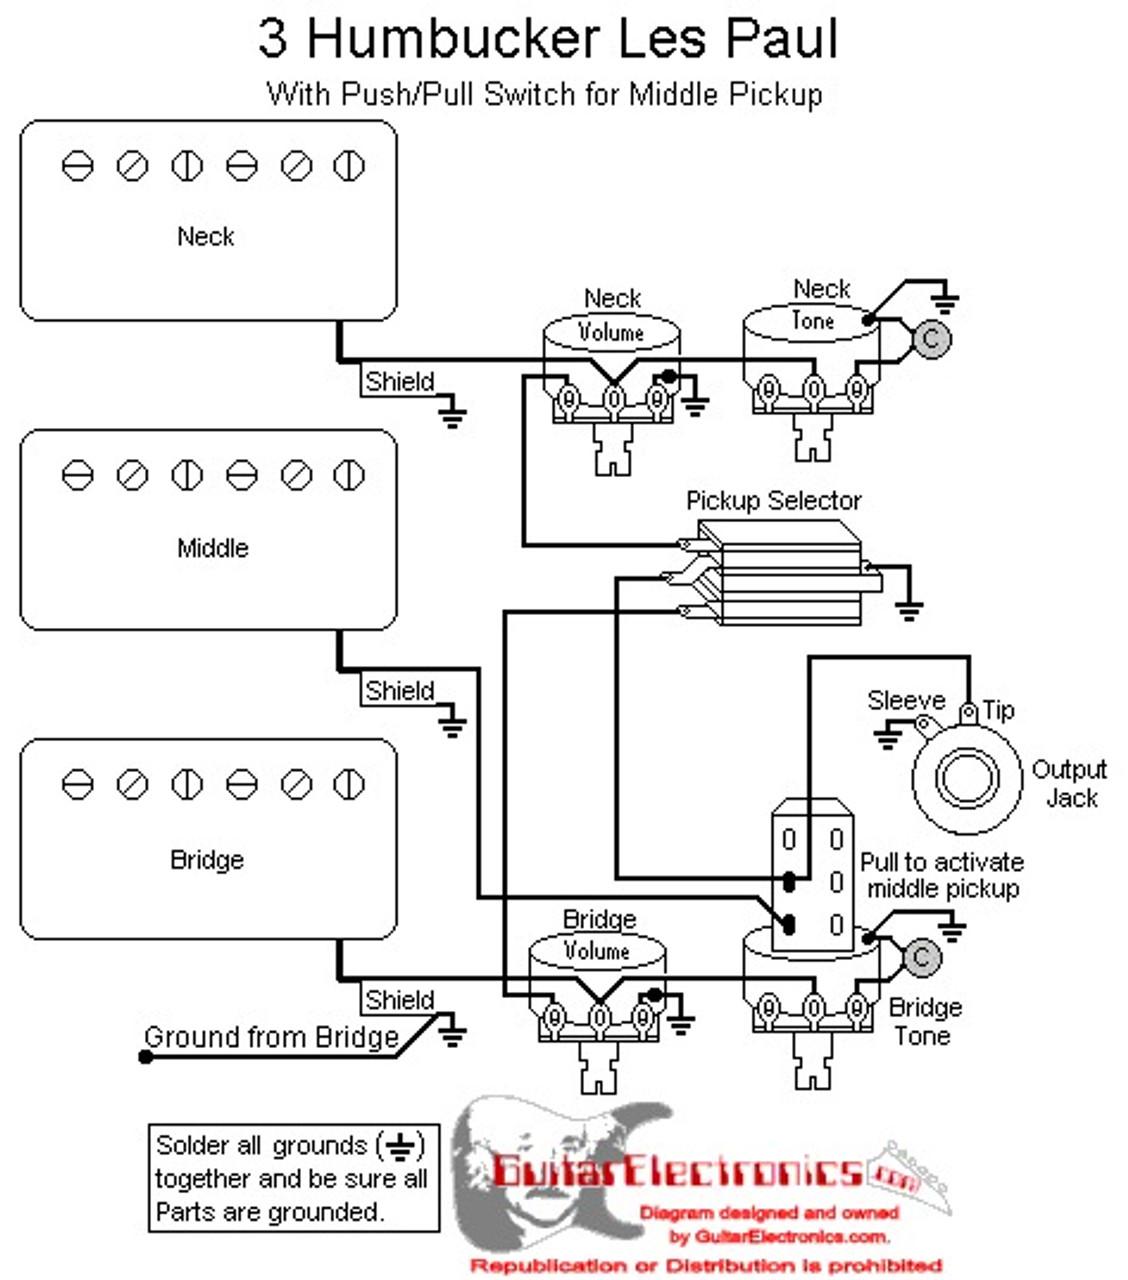 medium resolution of wdu hhh3t22 02 3 pickups wiring diagram 3 humbucker wiring diagram